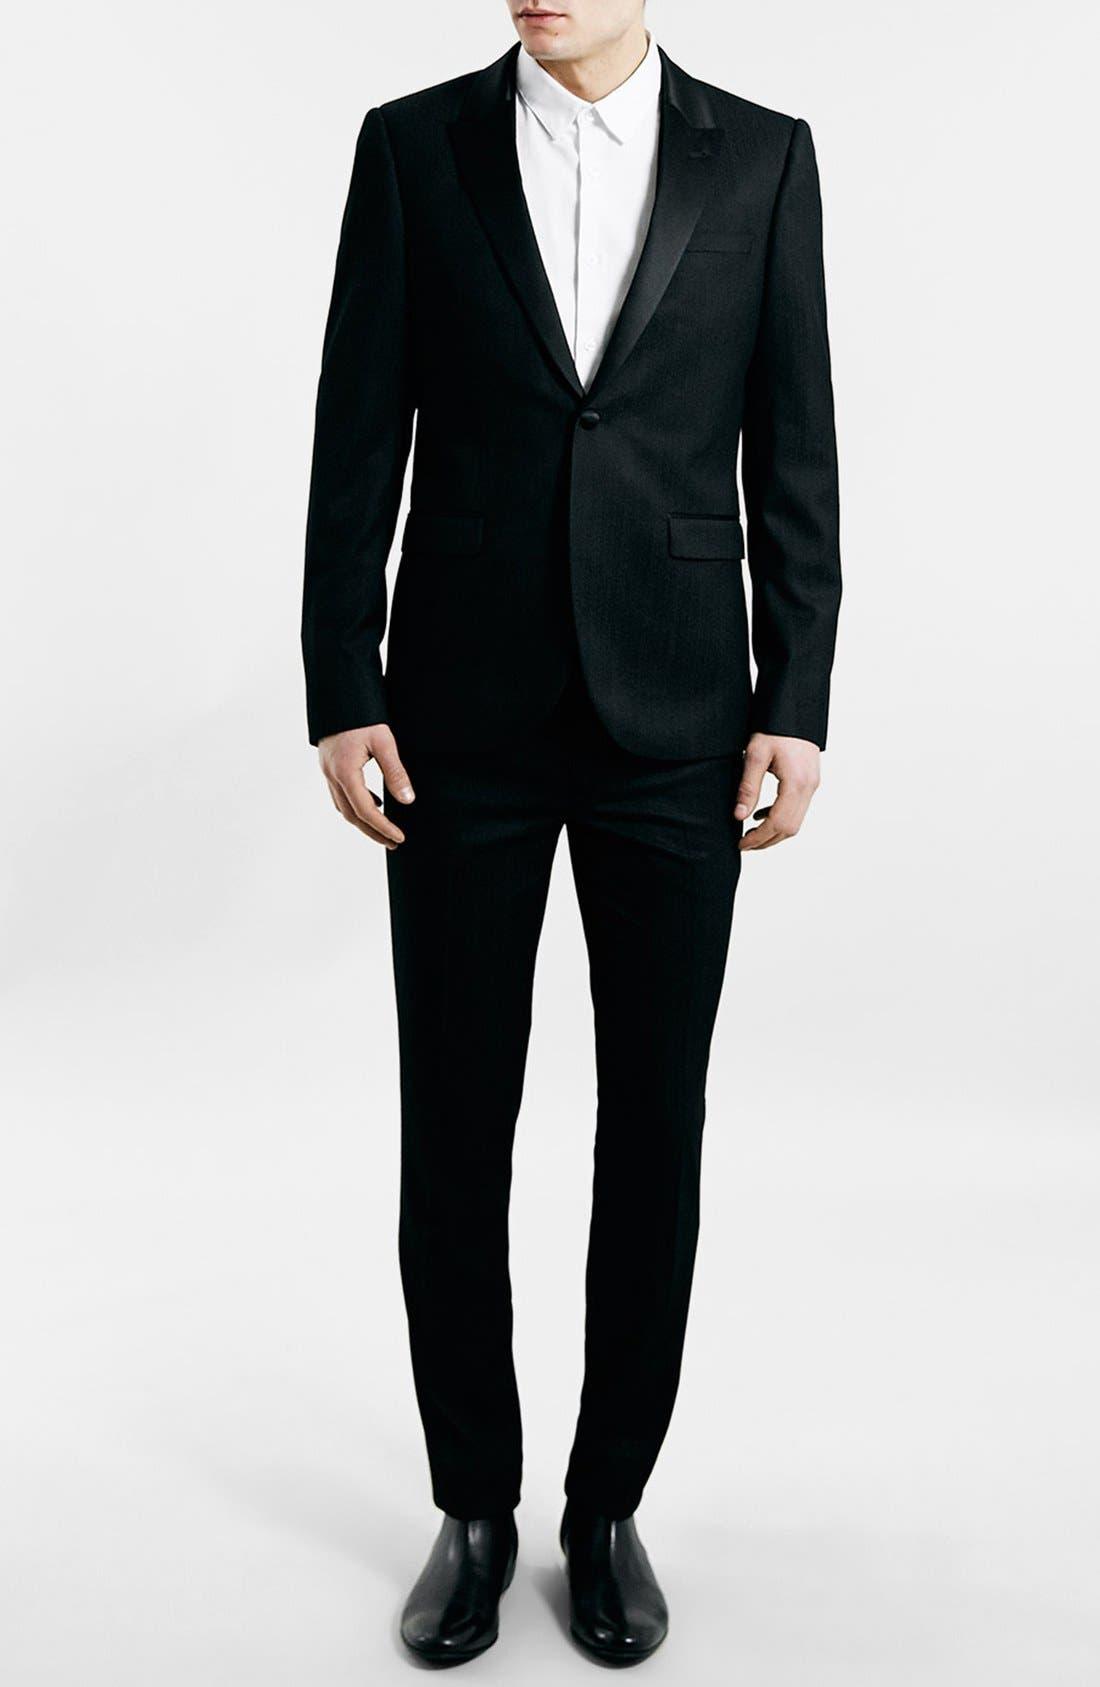 TOPMAN, Black Textured Skinny Fit Tuxedo Jacket, Alternate thumbnail 2, color, 001